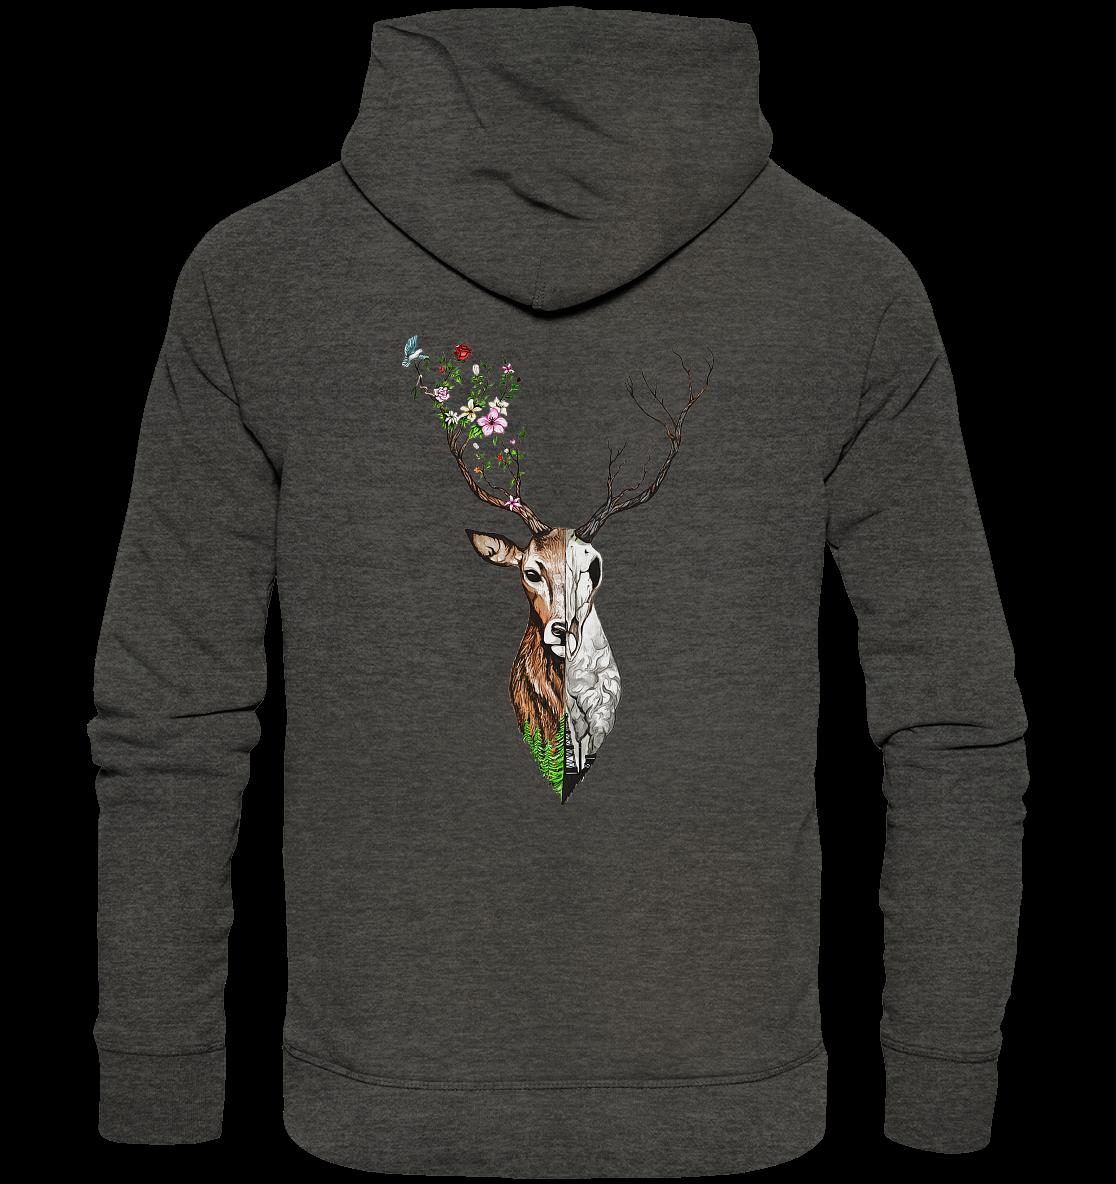 back-organic-hoodie-252625-1116x.png